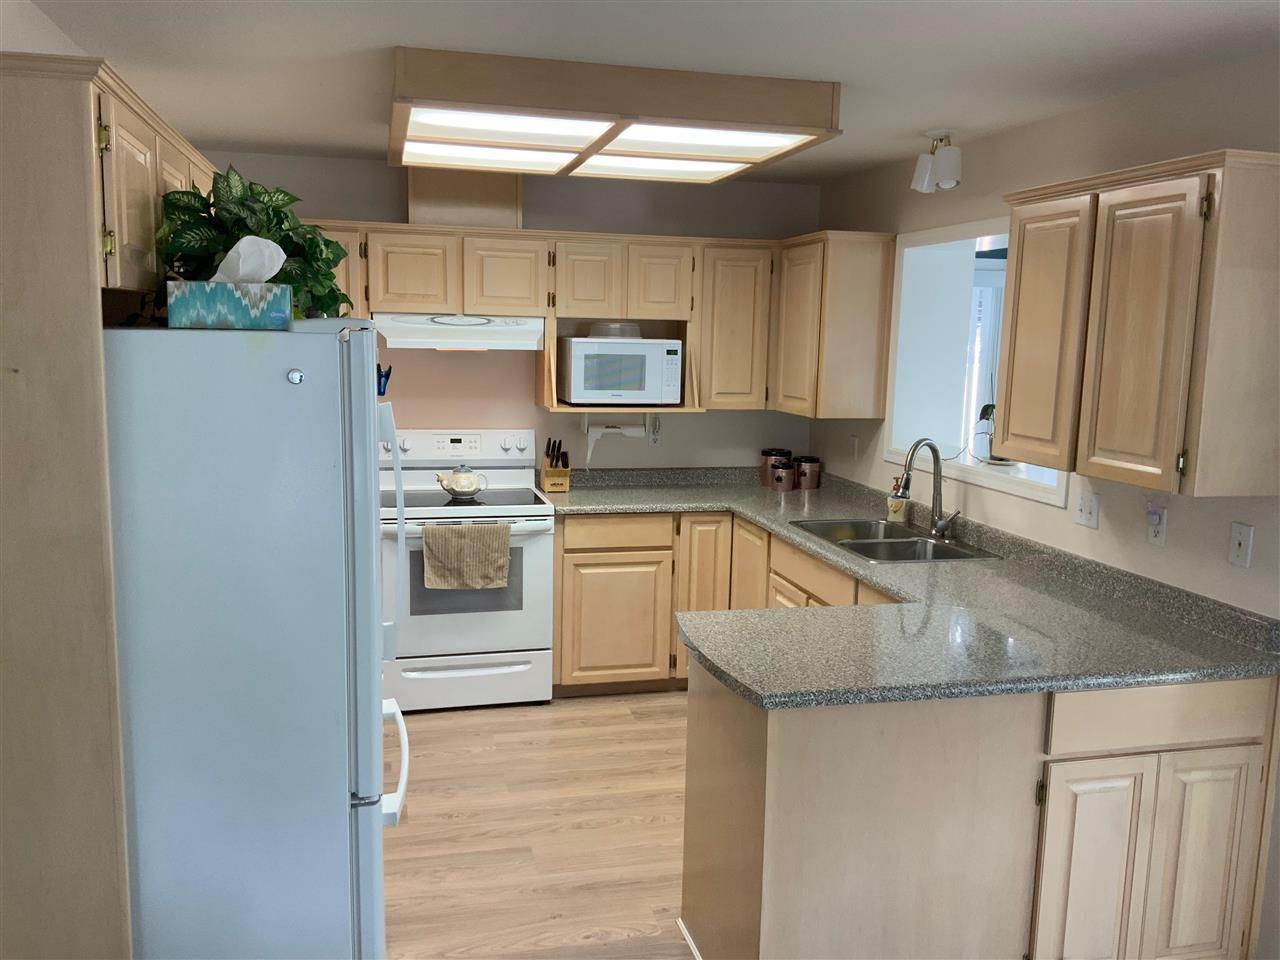 "Main Photo: 151 6001 PROMONTORY Road in Sardis: Vedder S Watson-Promontory House for sale in ""PROMONTORY LAKE ESTATES"" : MLS®# R2397556"